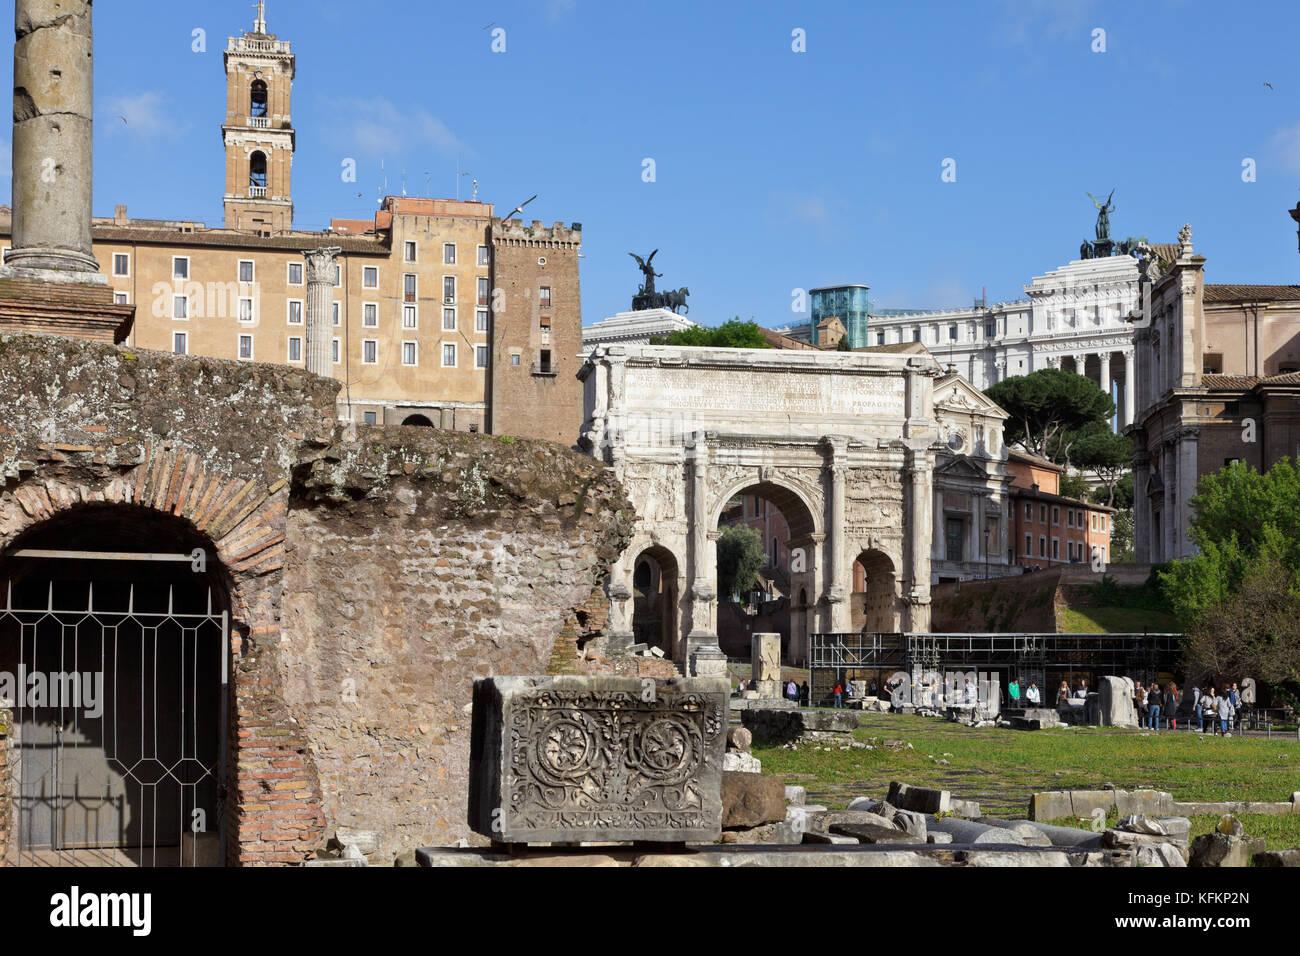 Roman Forum (Latin: Forum Romanum, Italian: Foro Romano), Rome, Italy - Stock Image